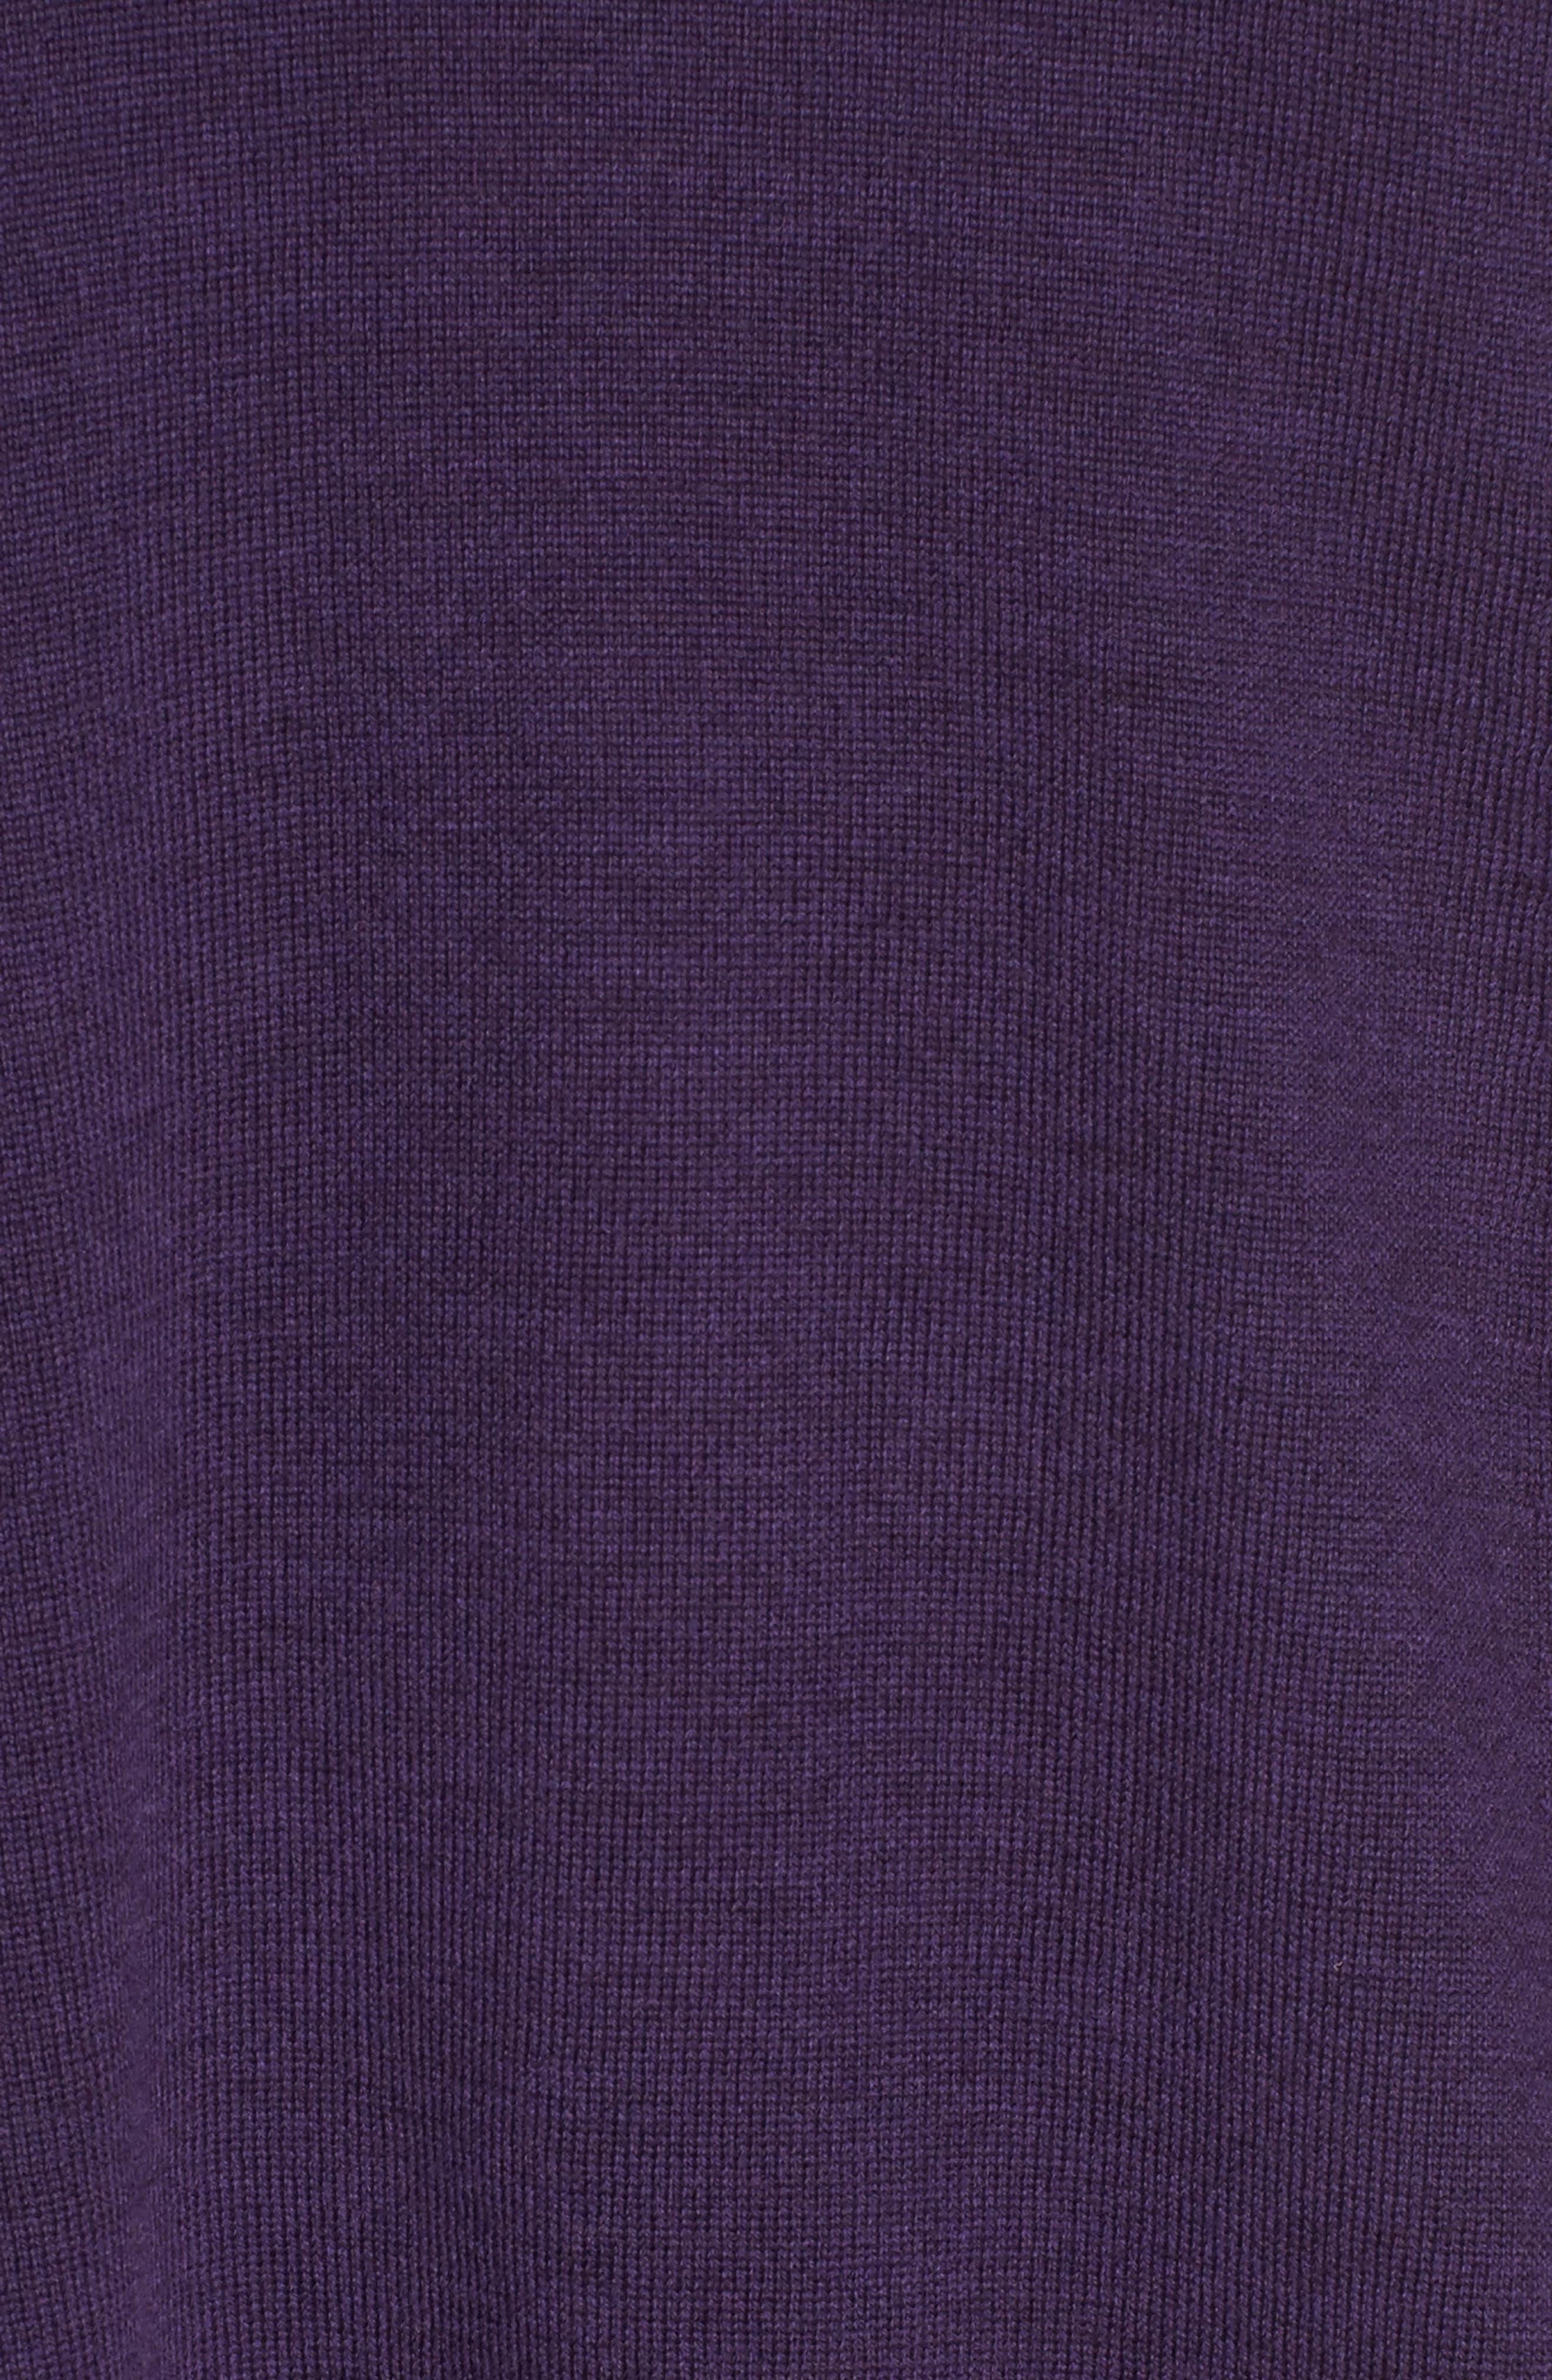 Lightweight Merino Jersey V-Neck Tunic,                             Alternate thumbnail 88, color,